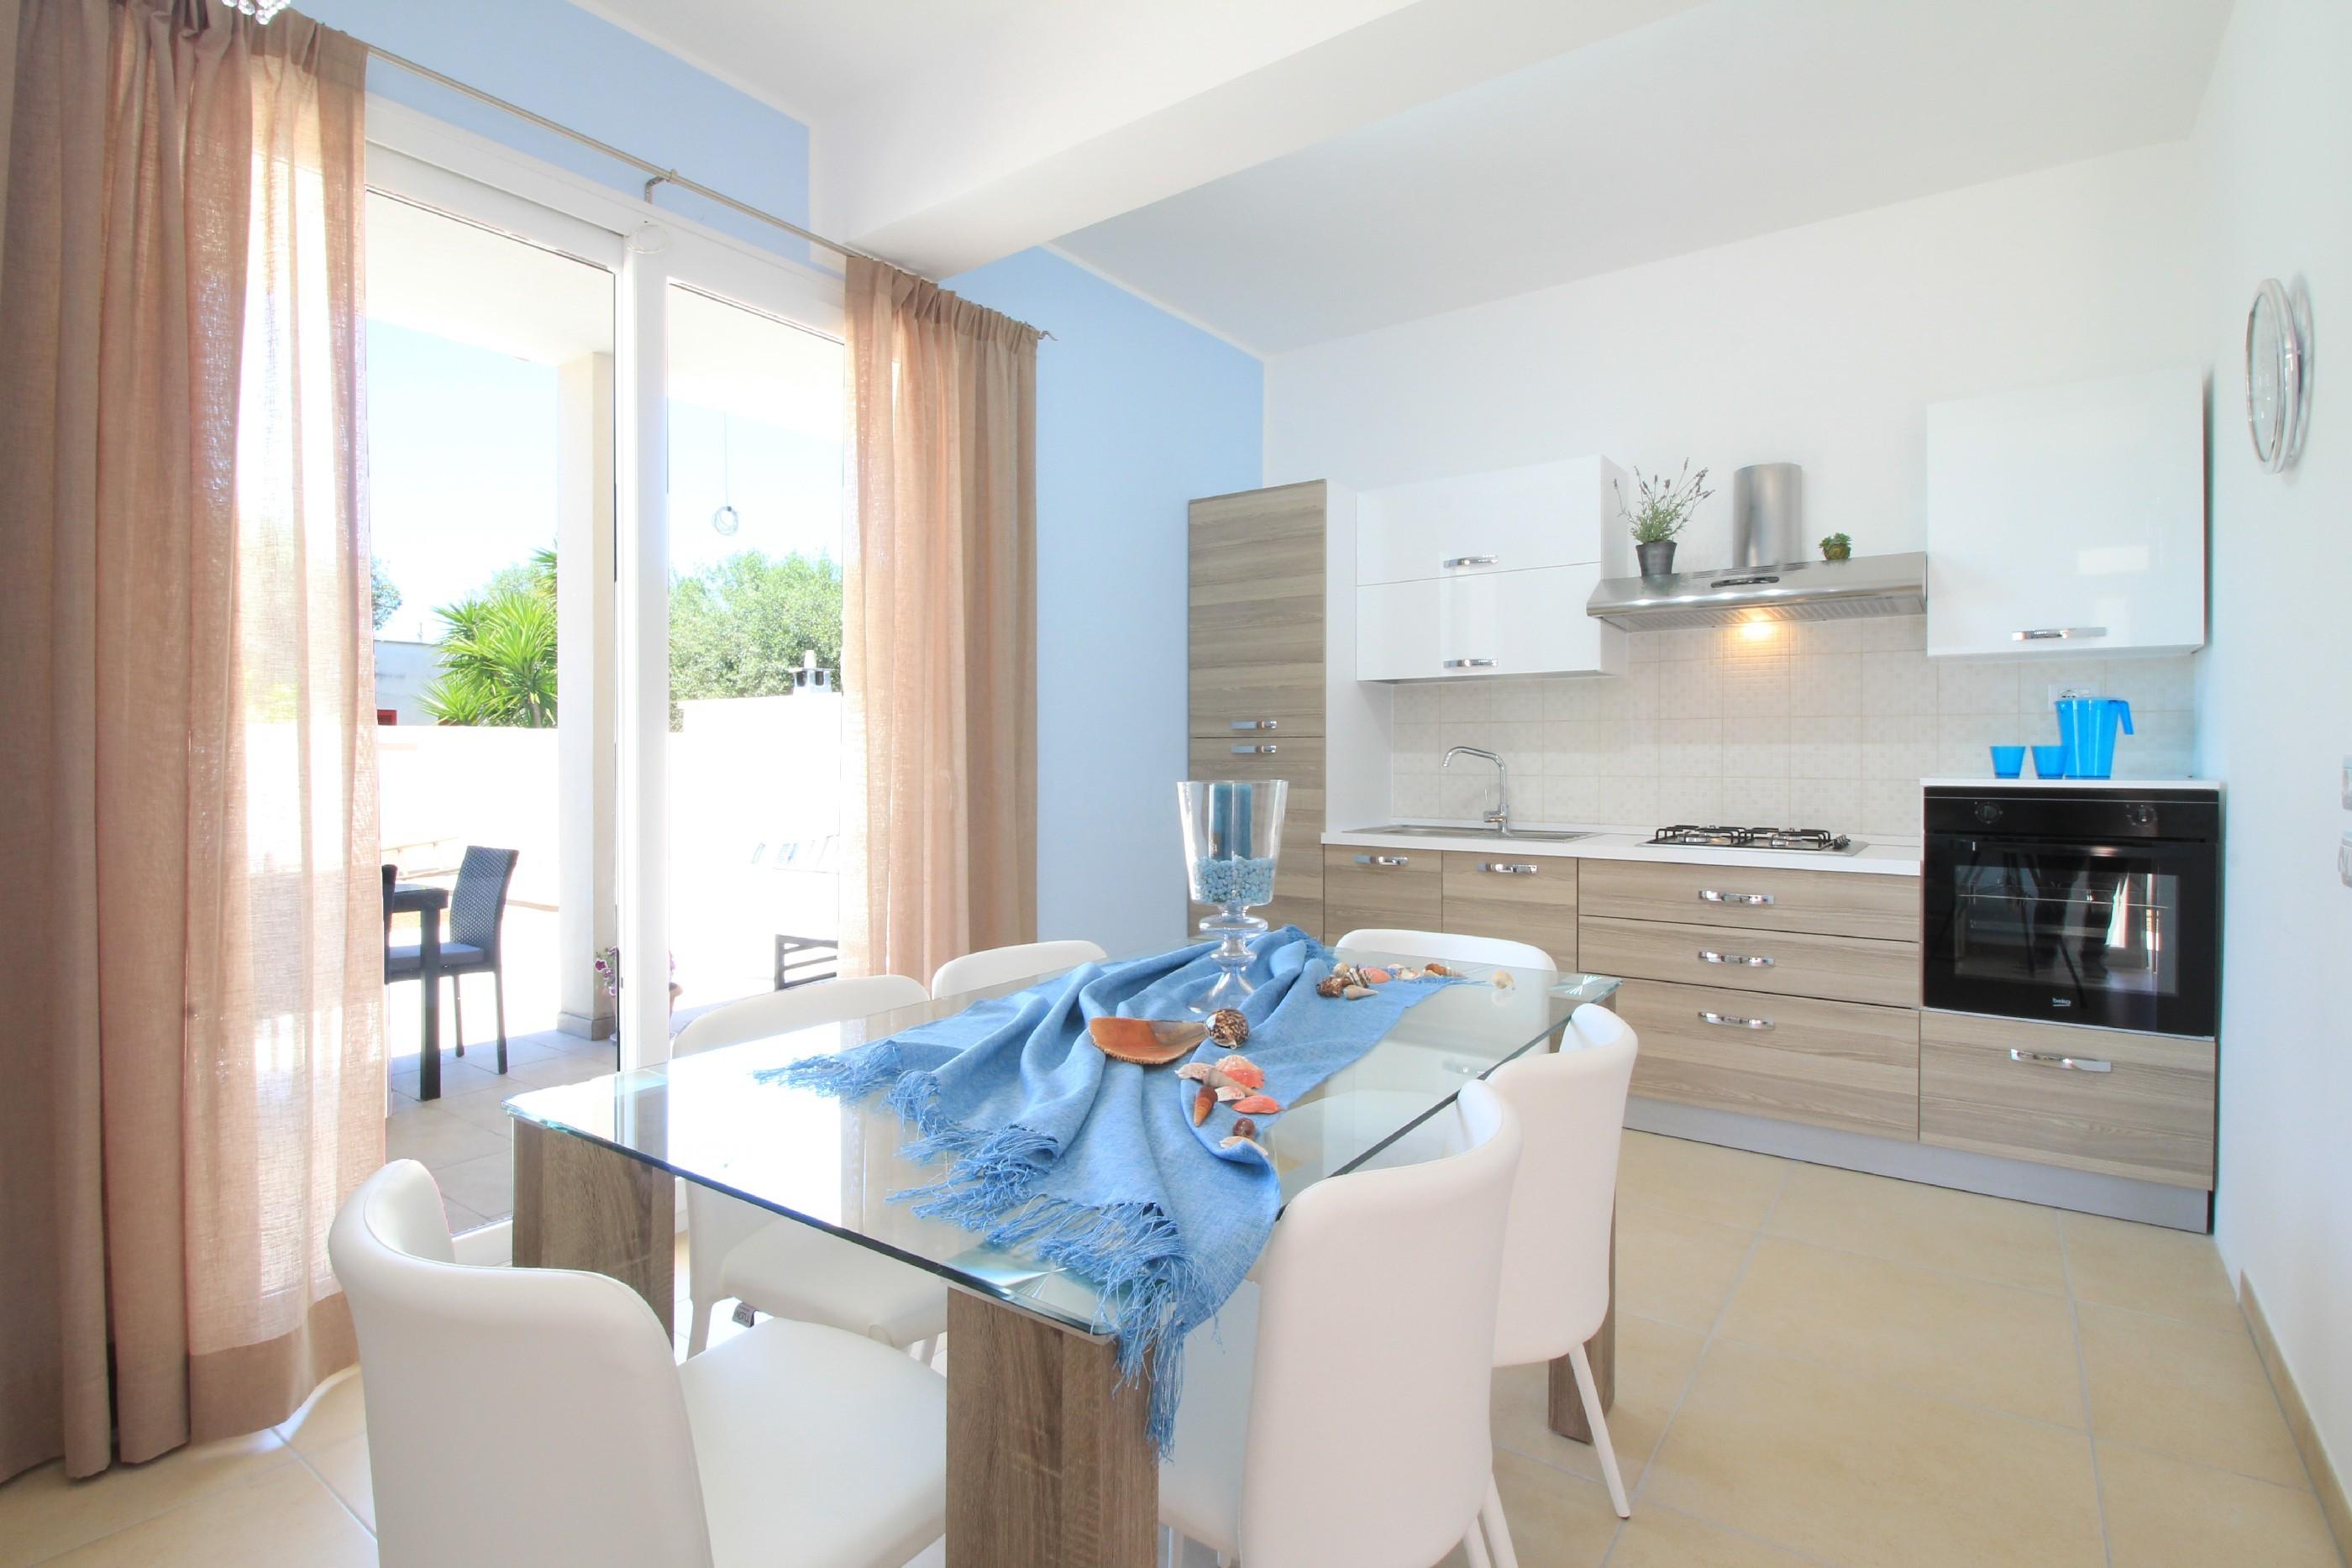 Apartment Elcisia luxe beach house photo 20260791